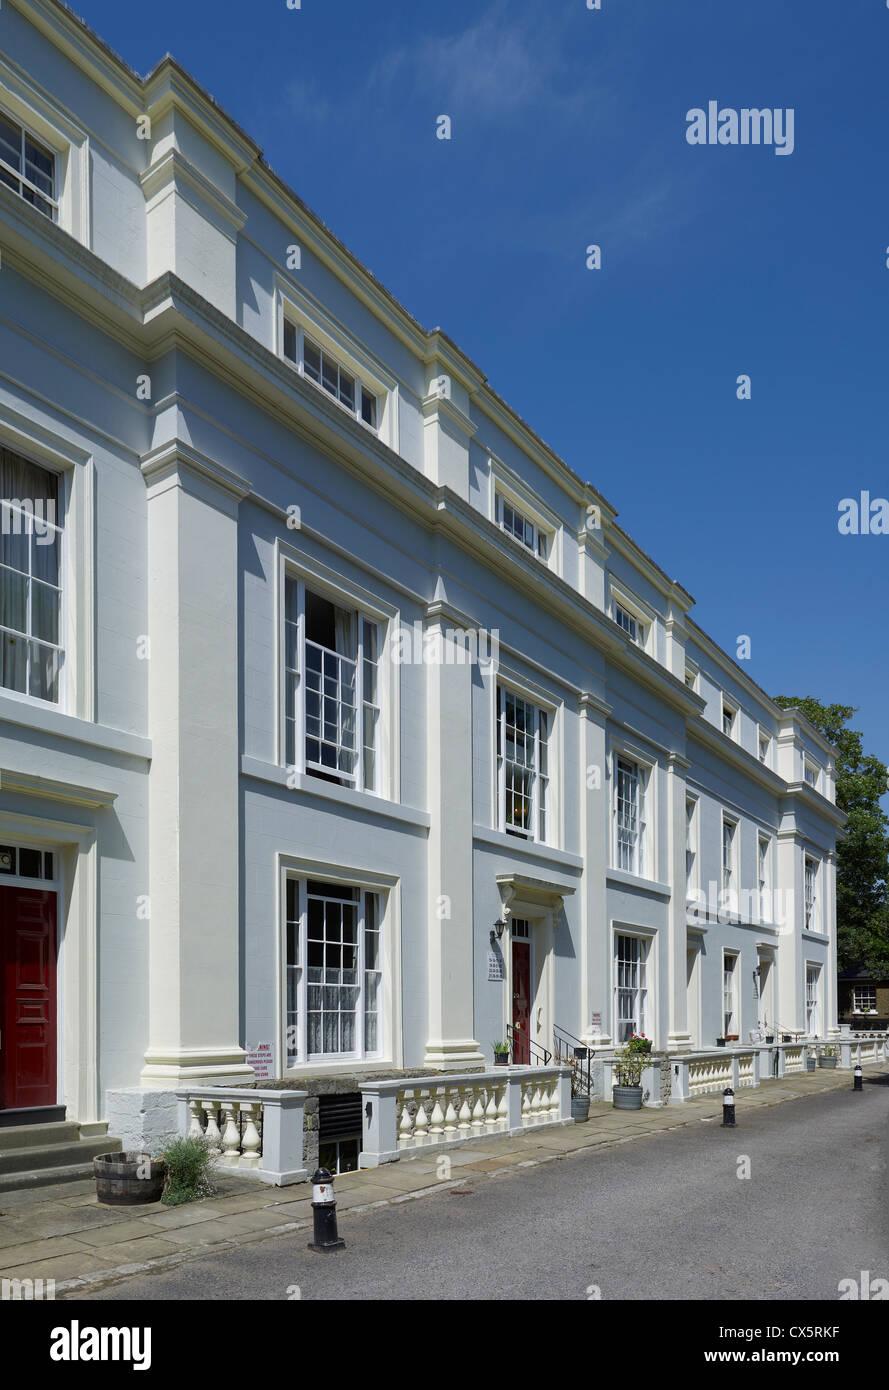 Madistone, Kent. Rocky Hill Terrace - Stock Image